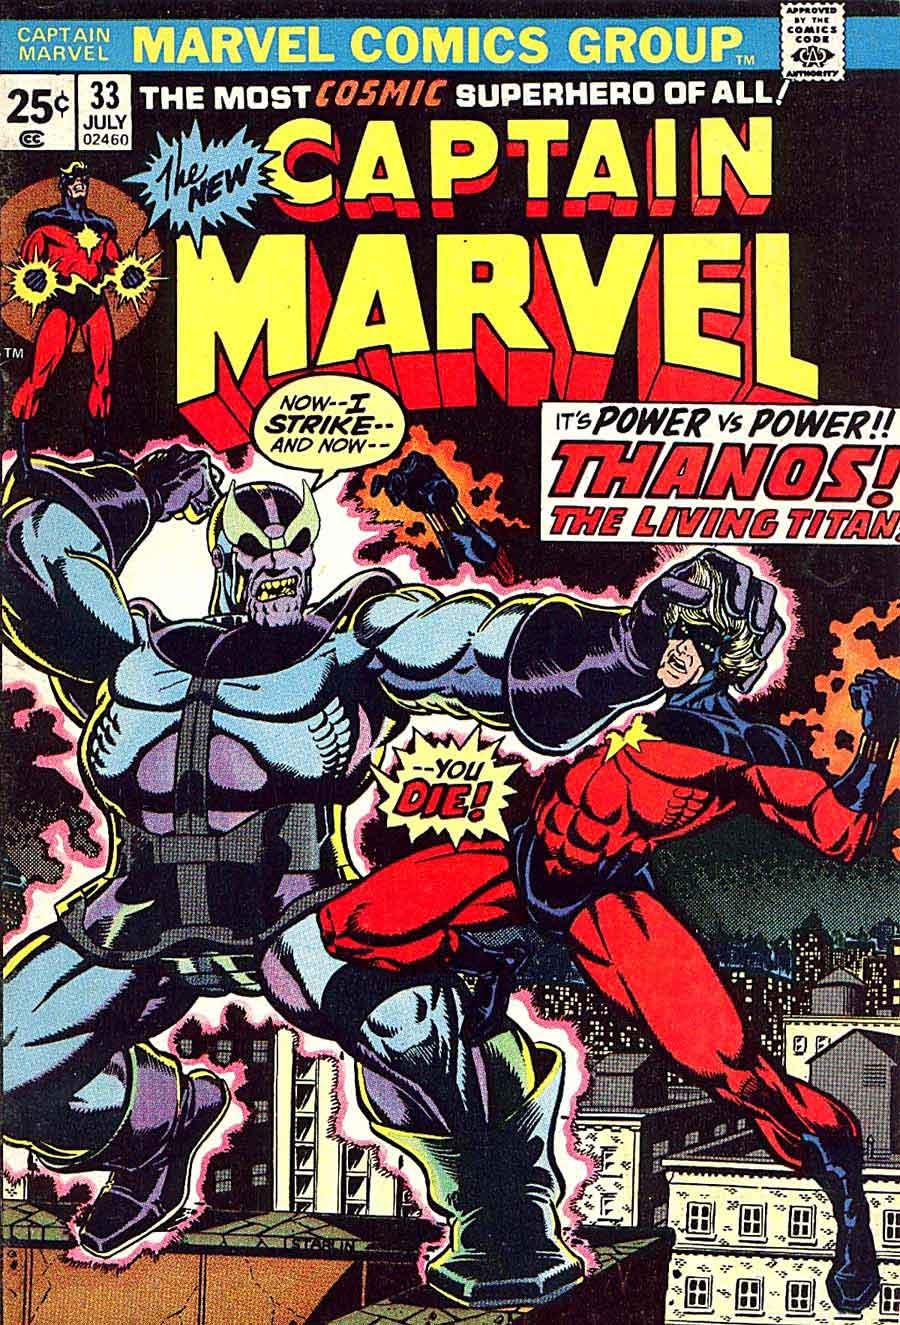 Captain Marvel #33 marvel 1970s bronze age comic book cover art by Jim Starlin